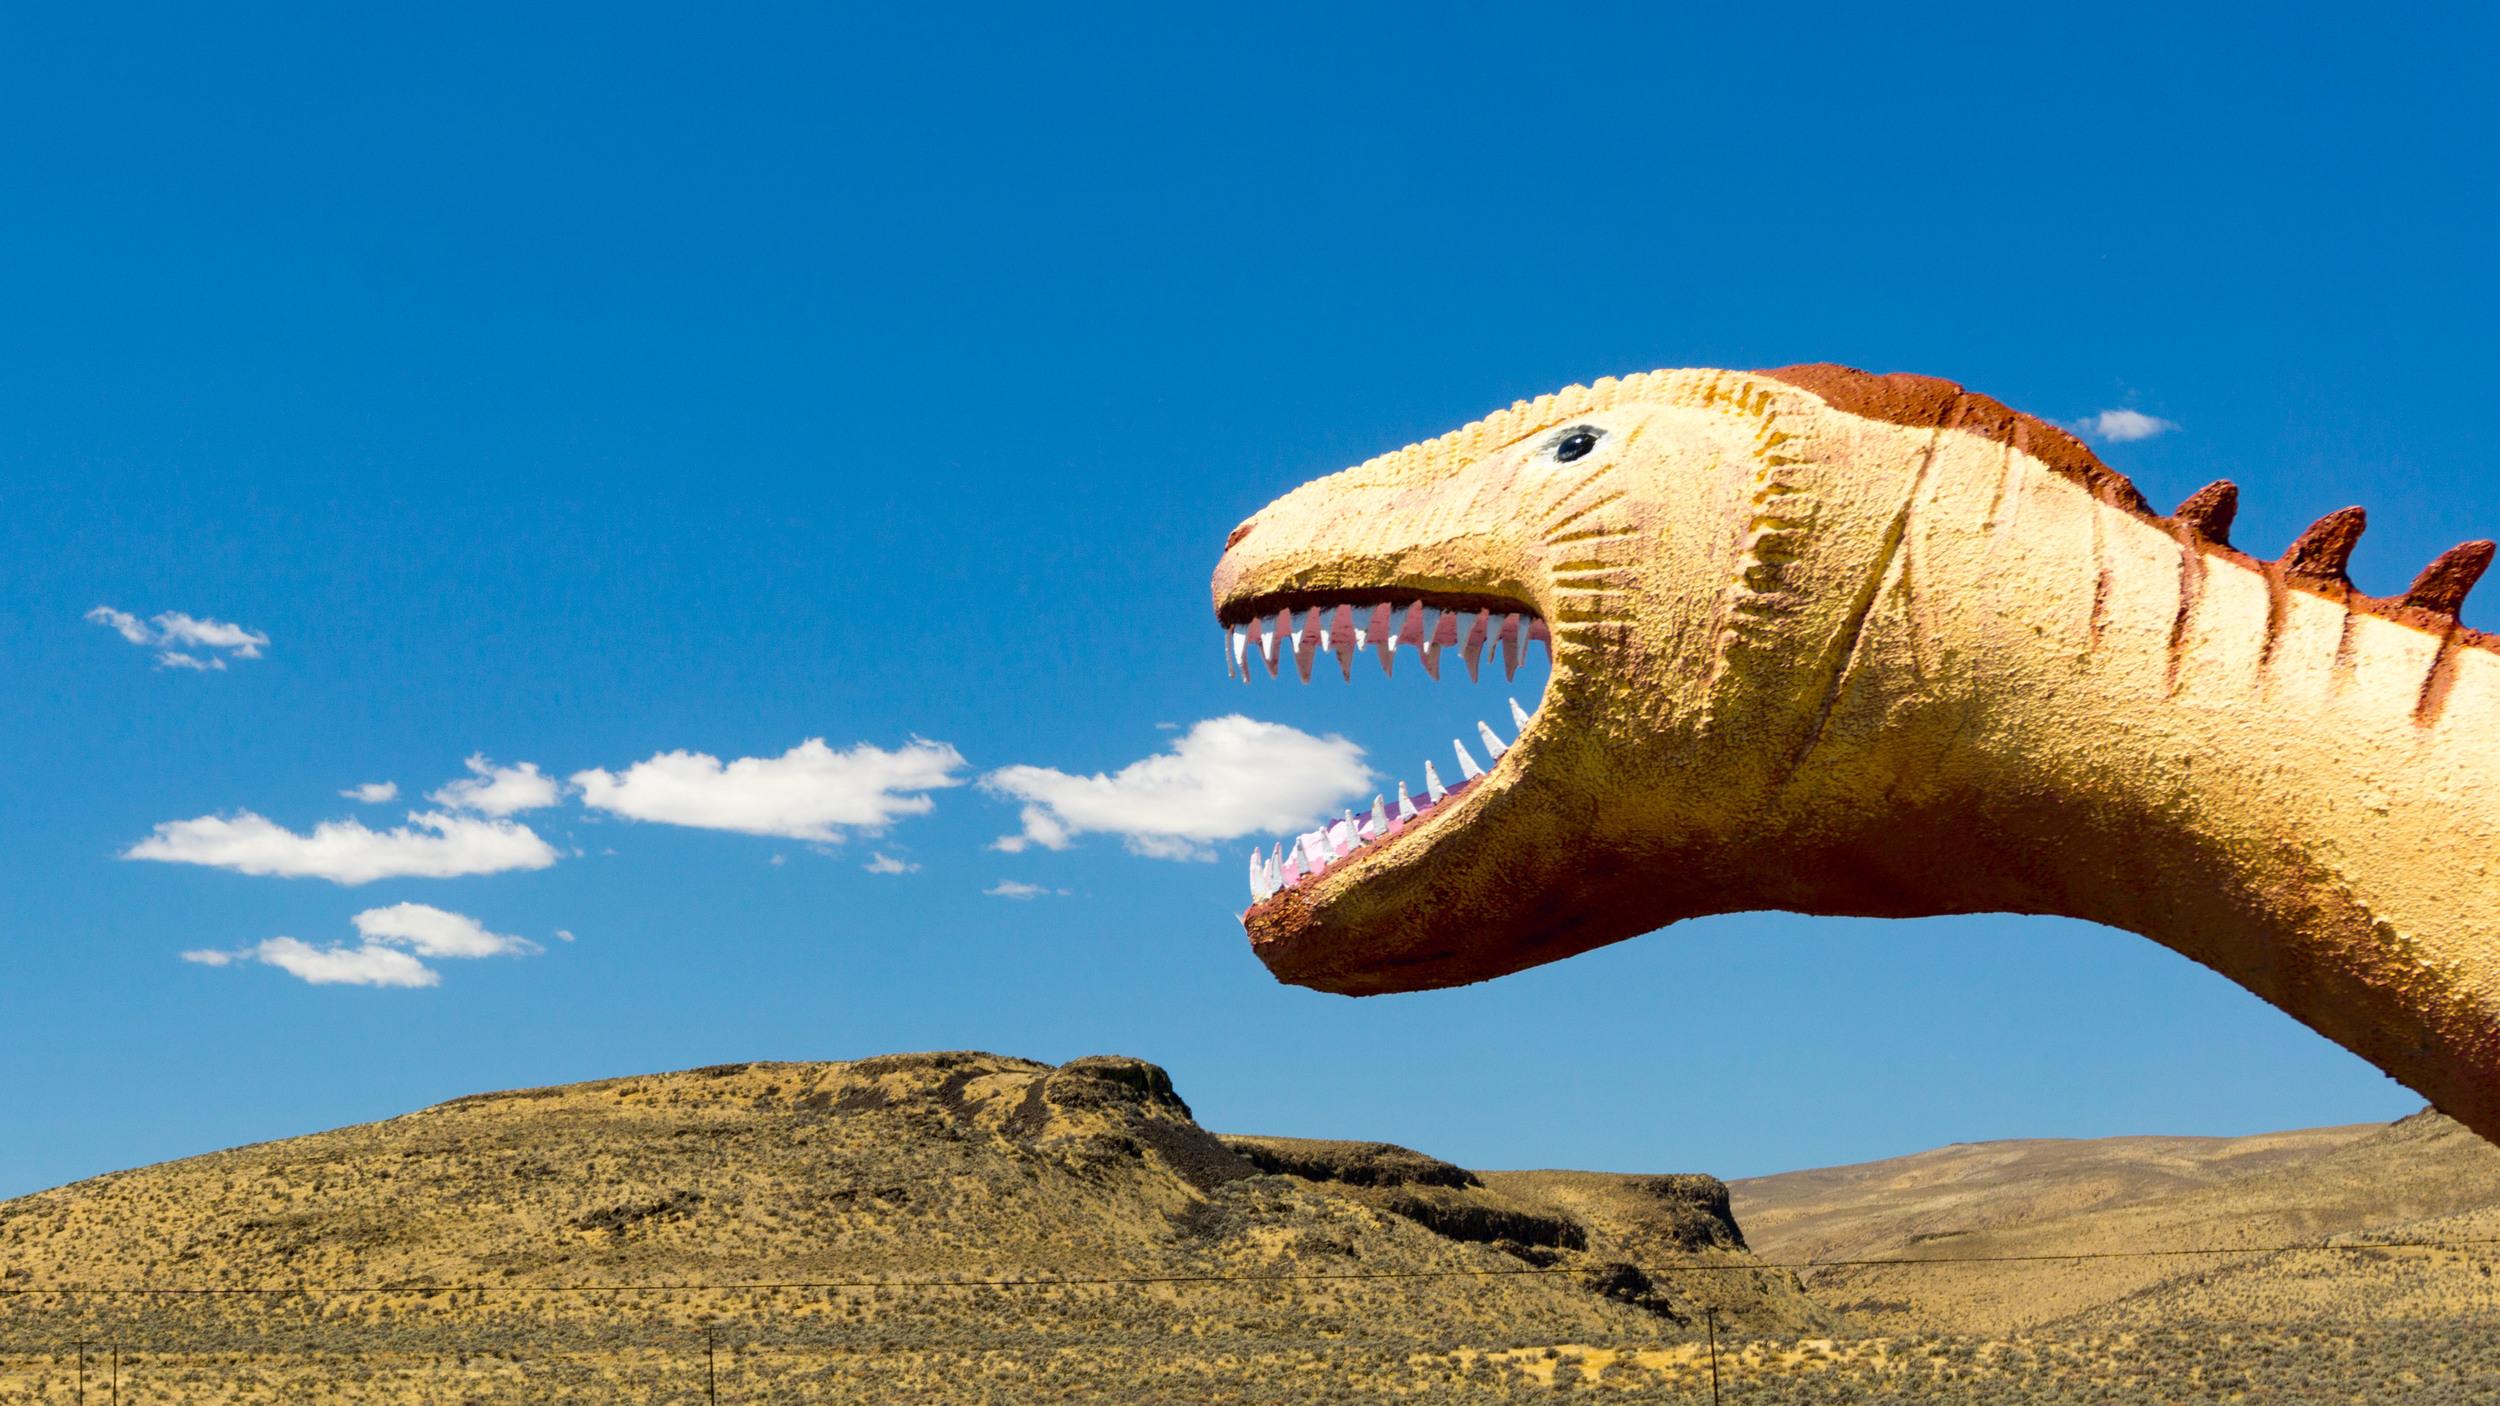 #dinosaur #fire #ginko #petrified #forest #washington #usa